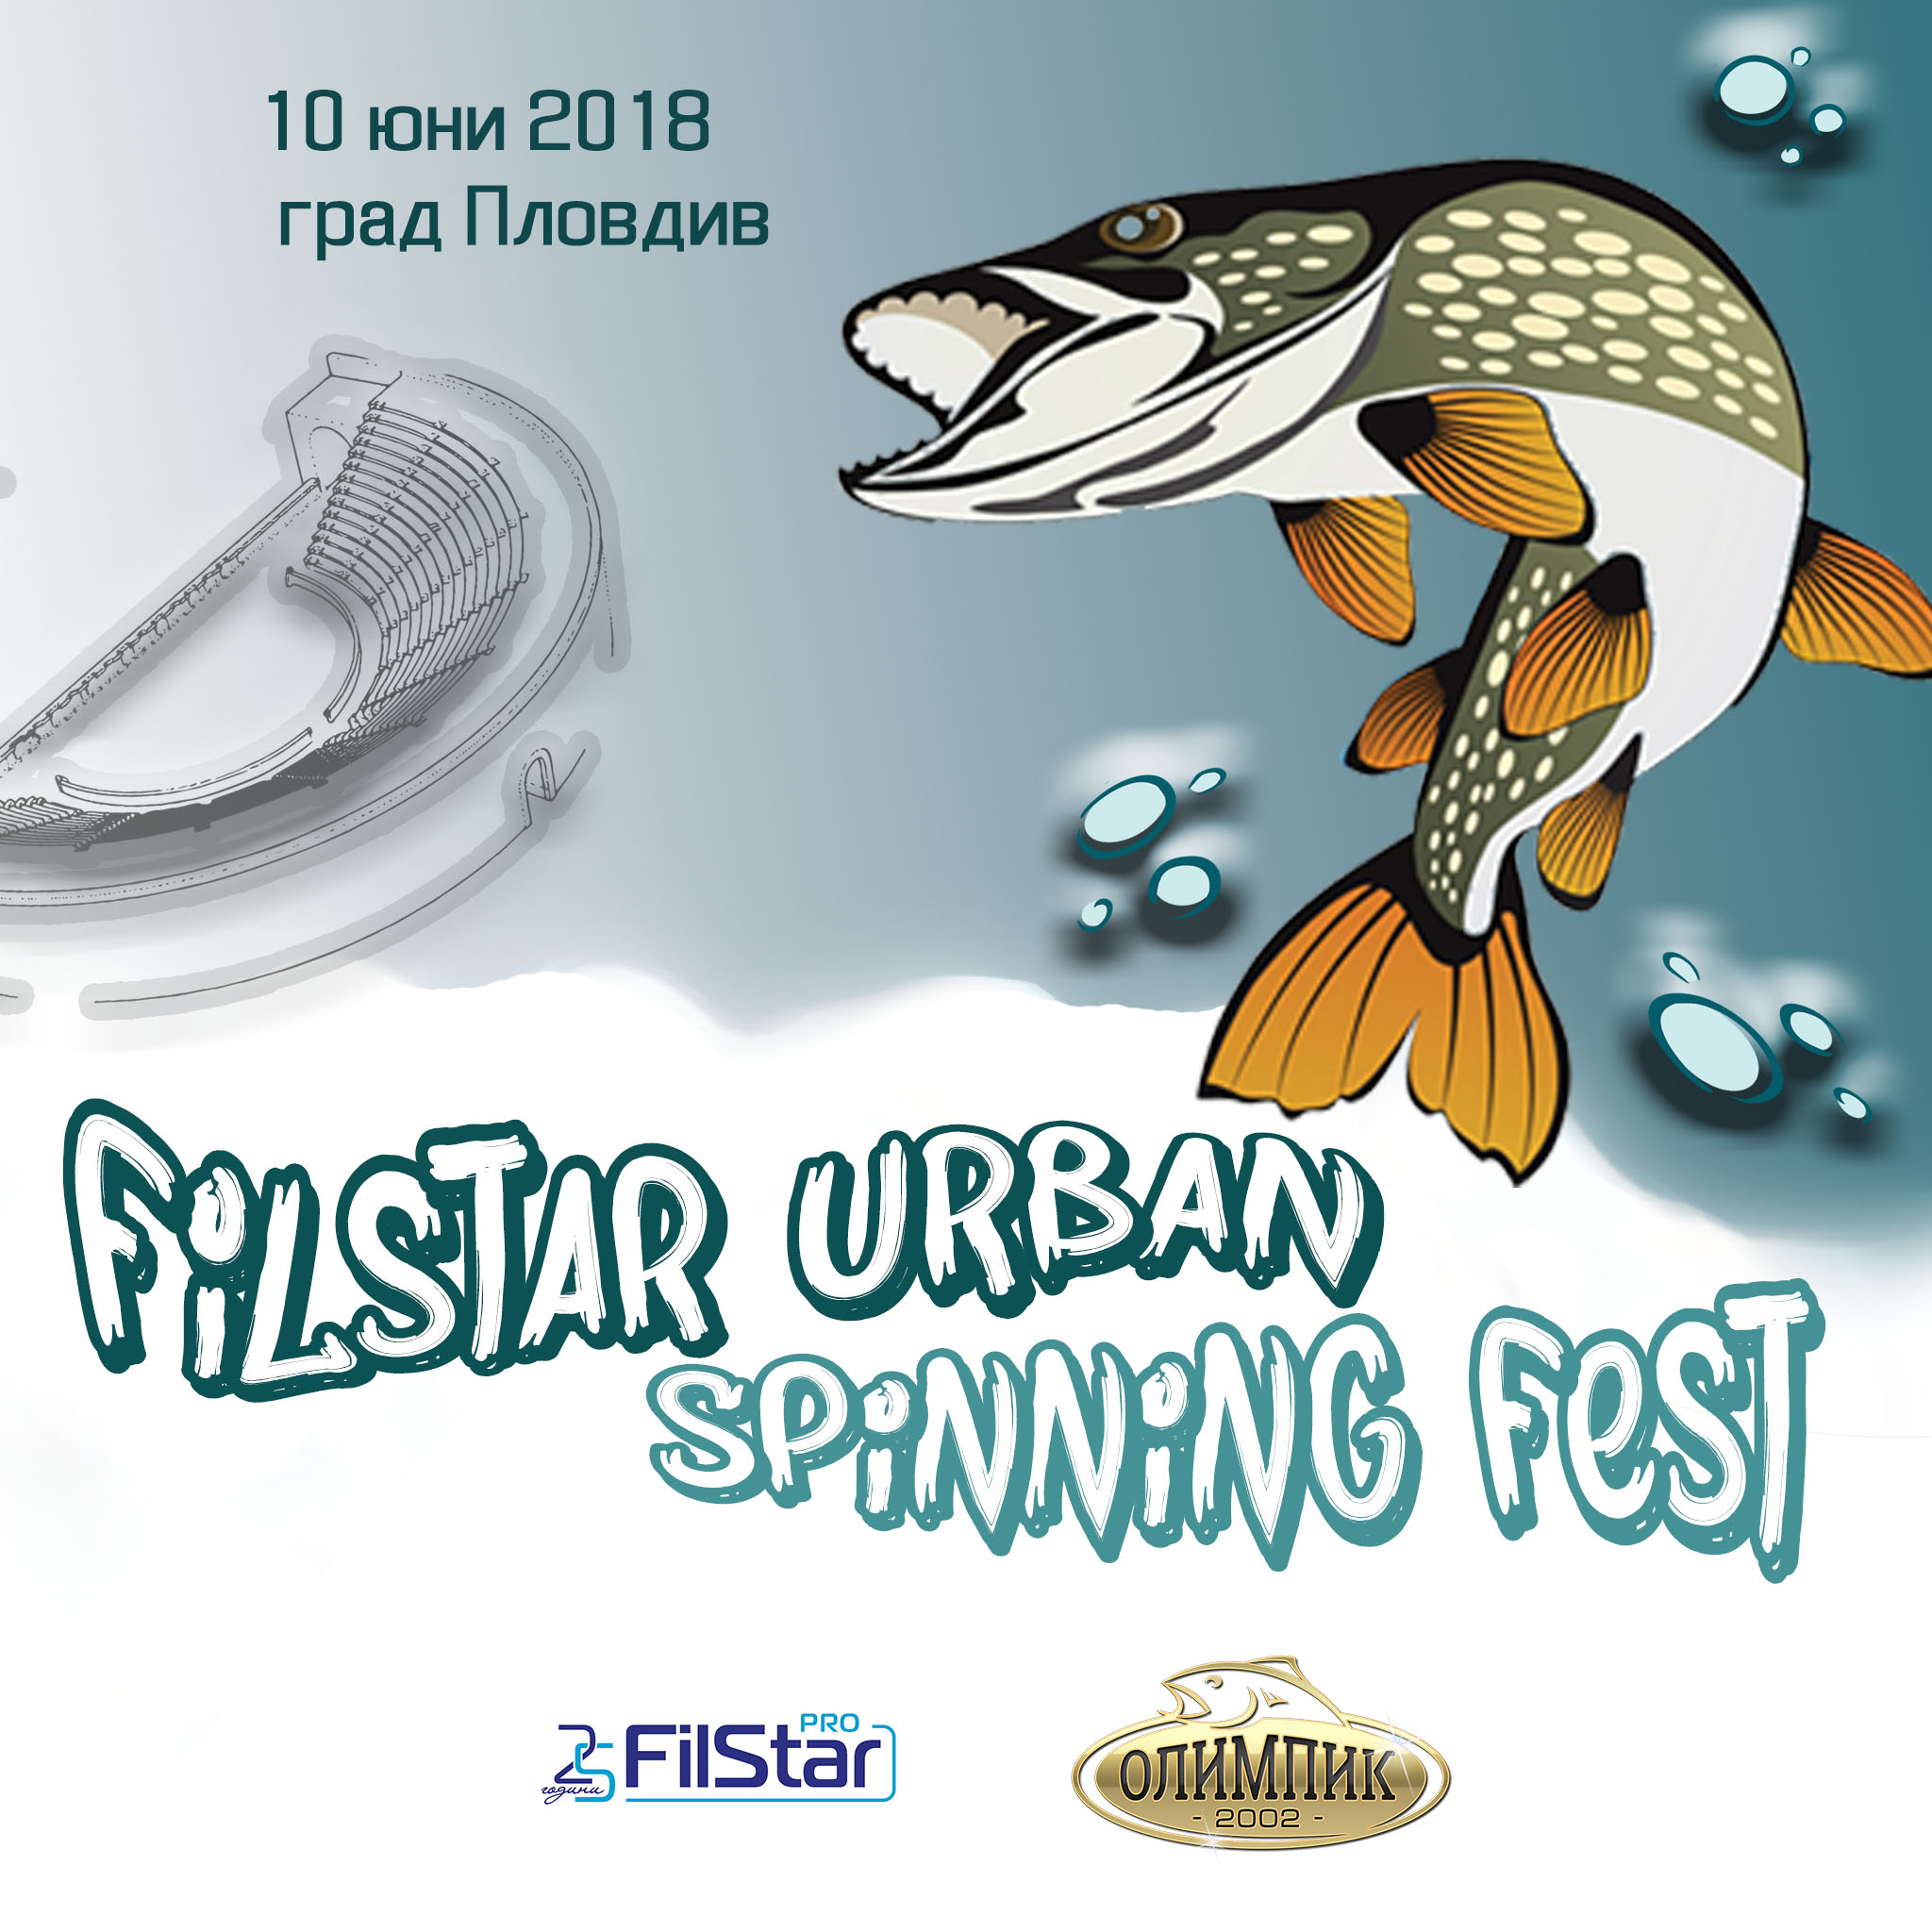 Fistar Urban Spinning Fest - подробна организация на мероприятието